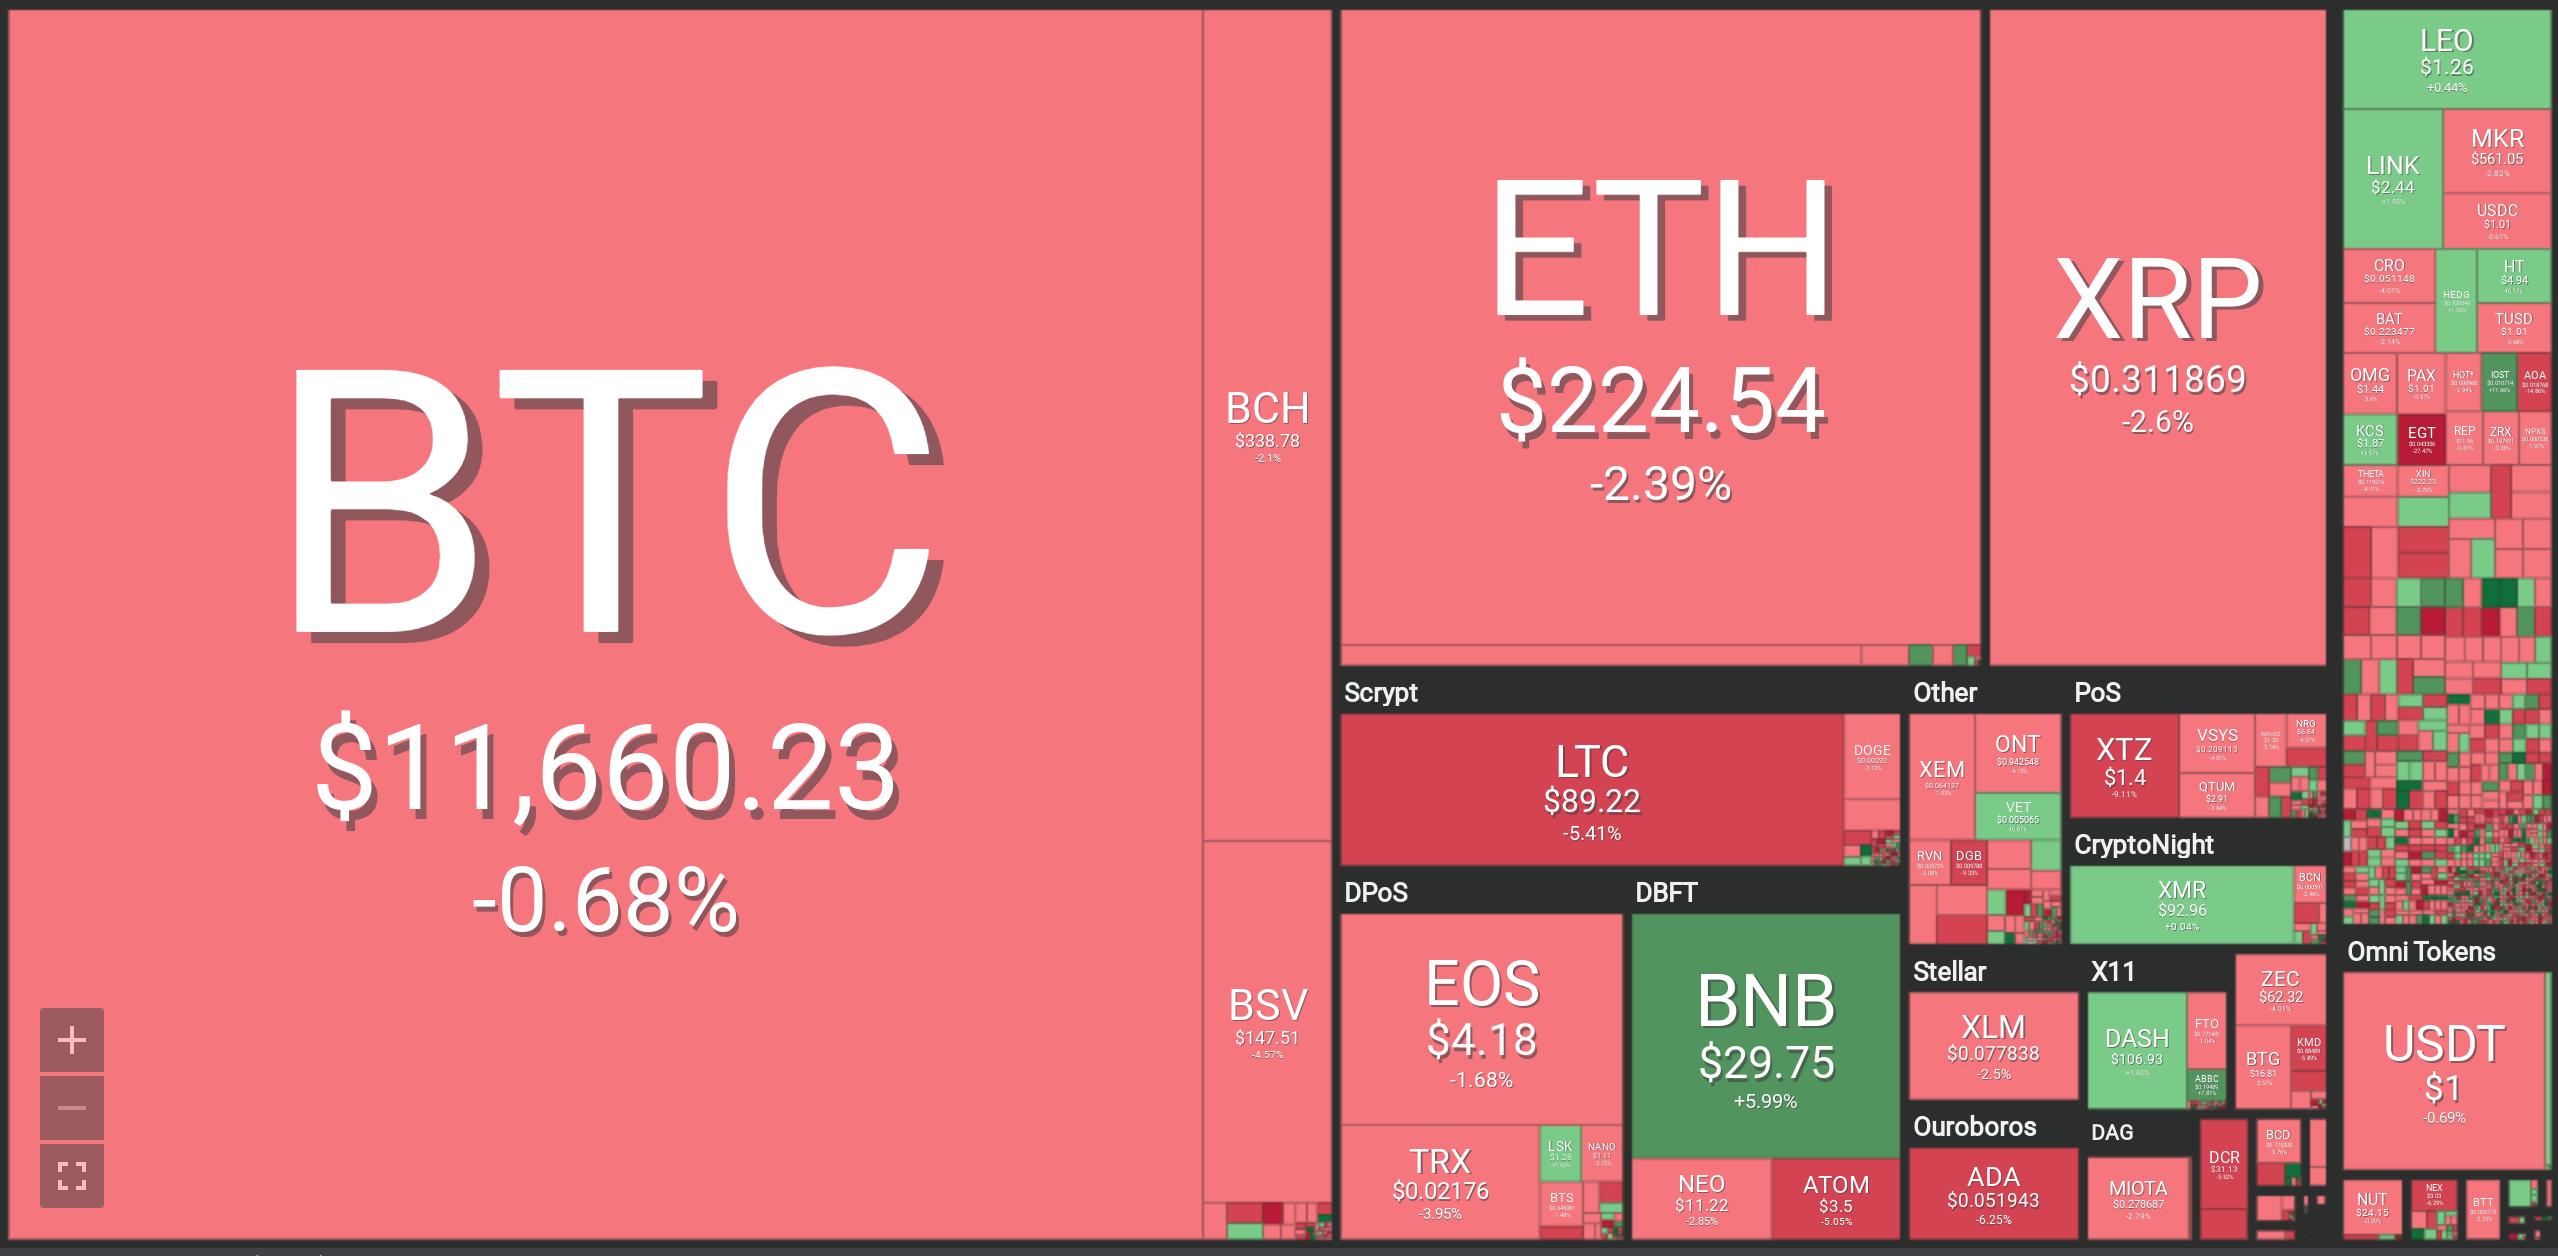 Will Bitcoin Break Resistance at 12K? Bitcoin, Ethereum, XRP, Litecoin, Bitcoin Cash, Cardano, Tron Forecasts